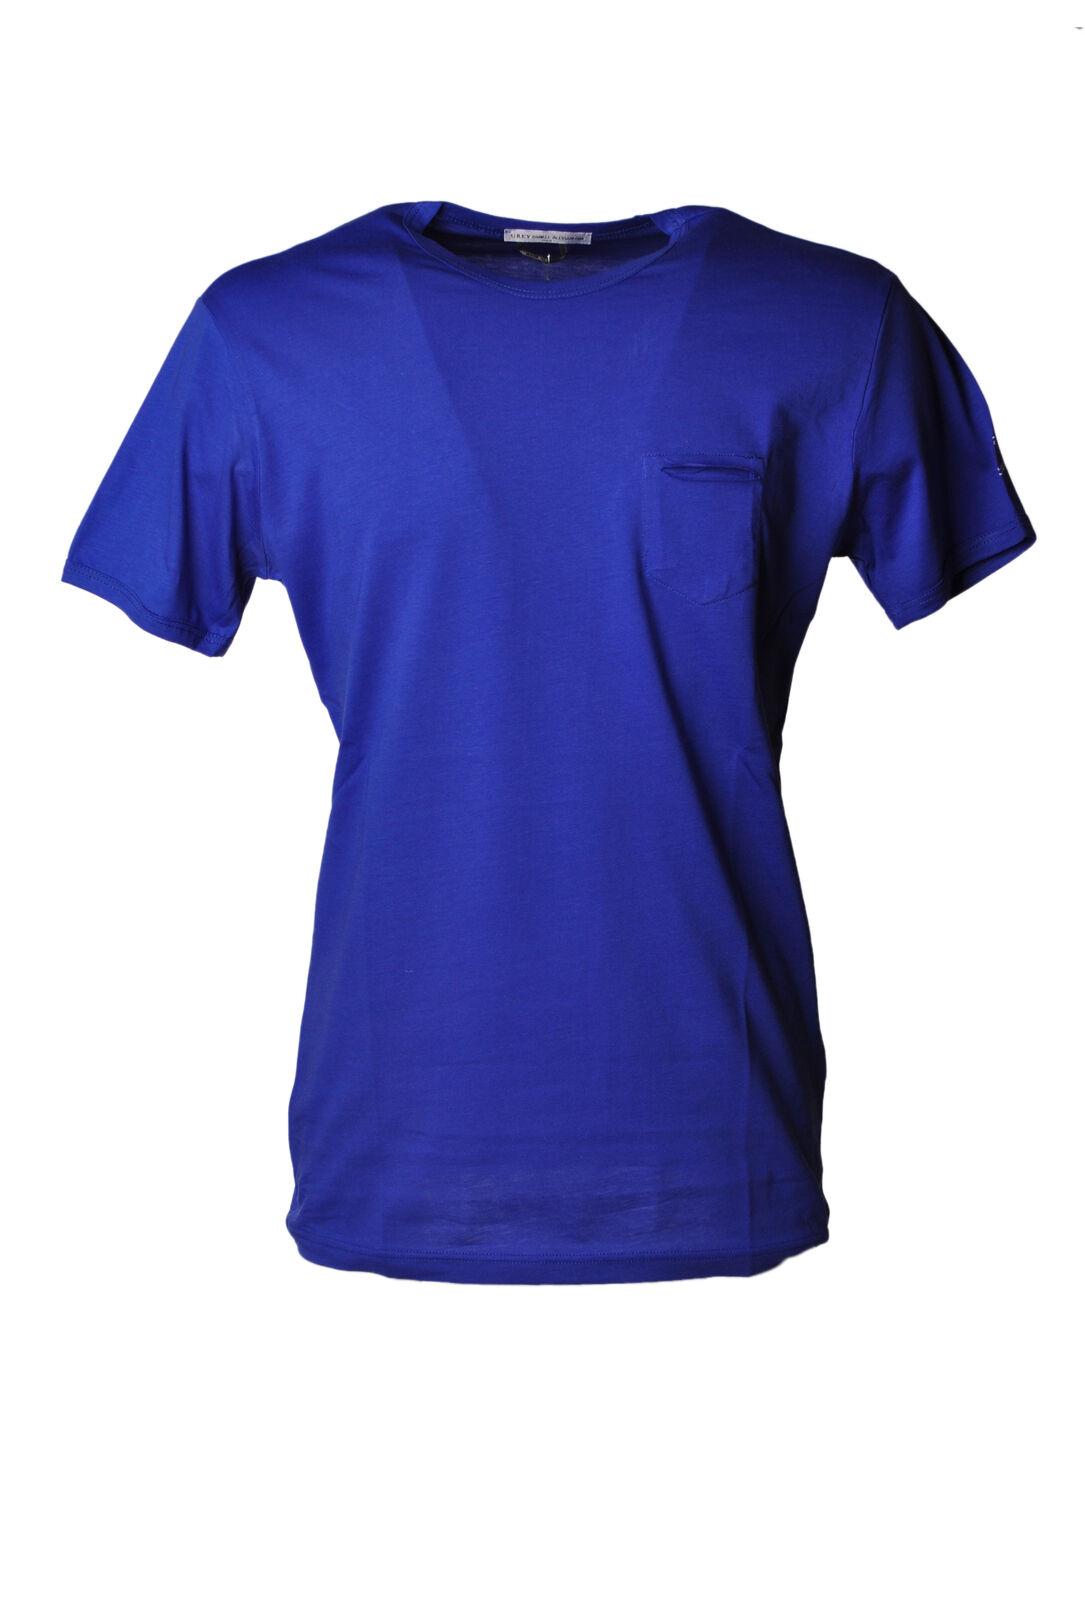 Daniele Alessandrini - Topwear-T-shirts - Man - Blau - 4720205E184347